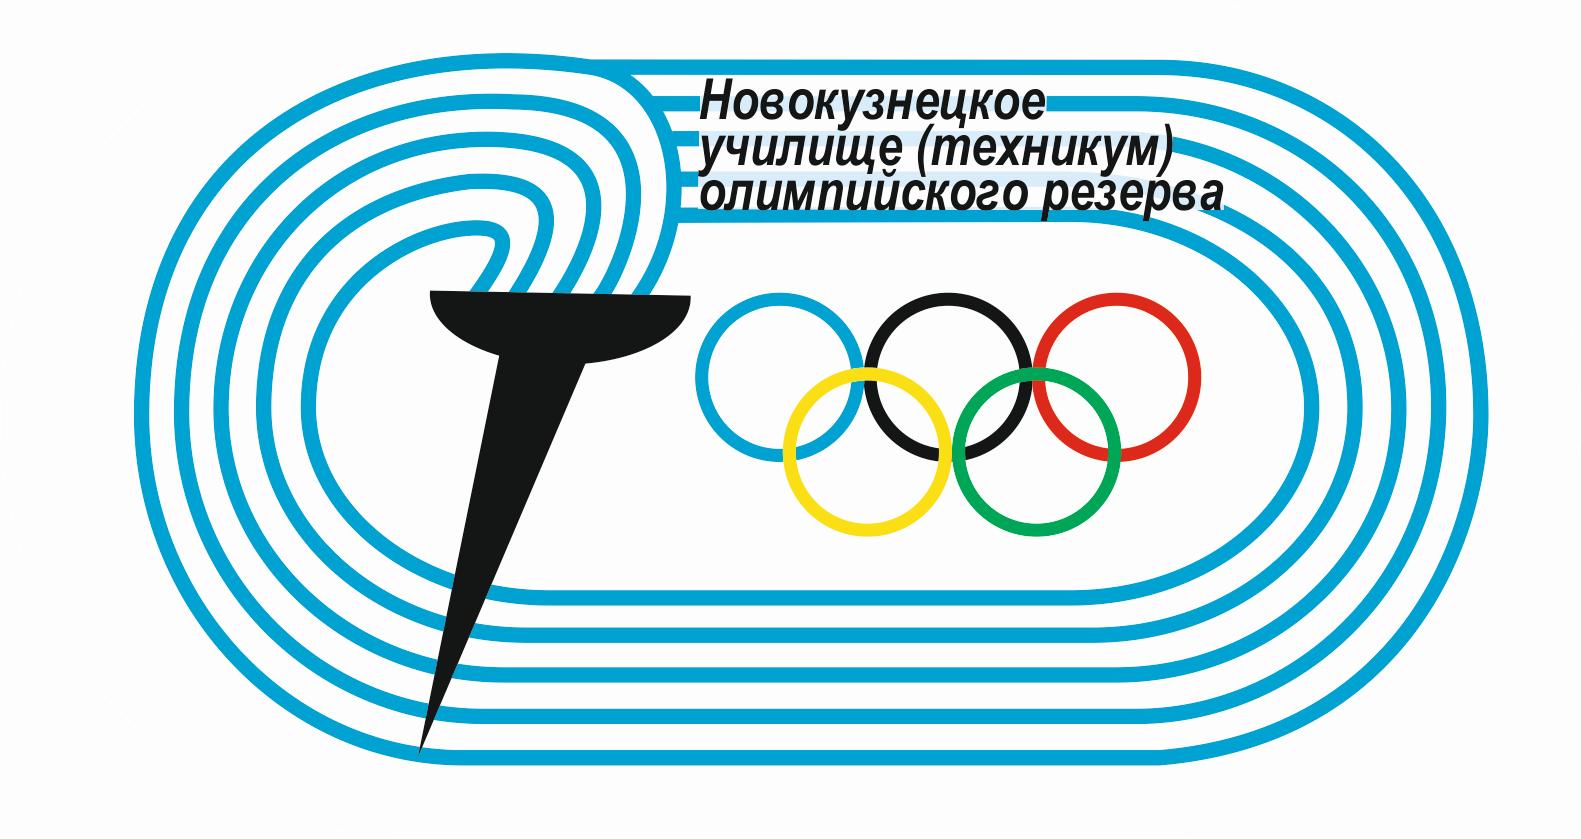 эмблема 2015 последняя.tif